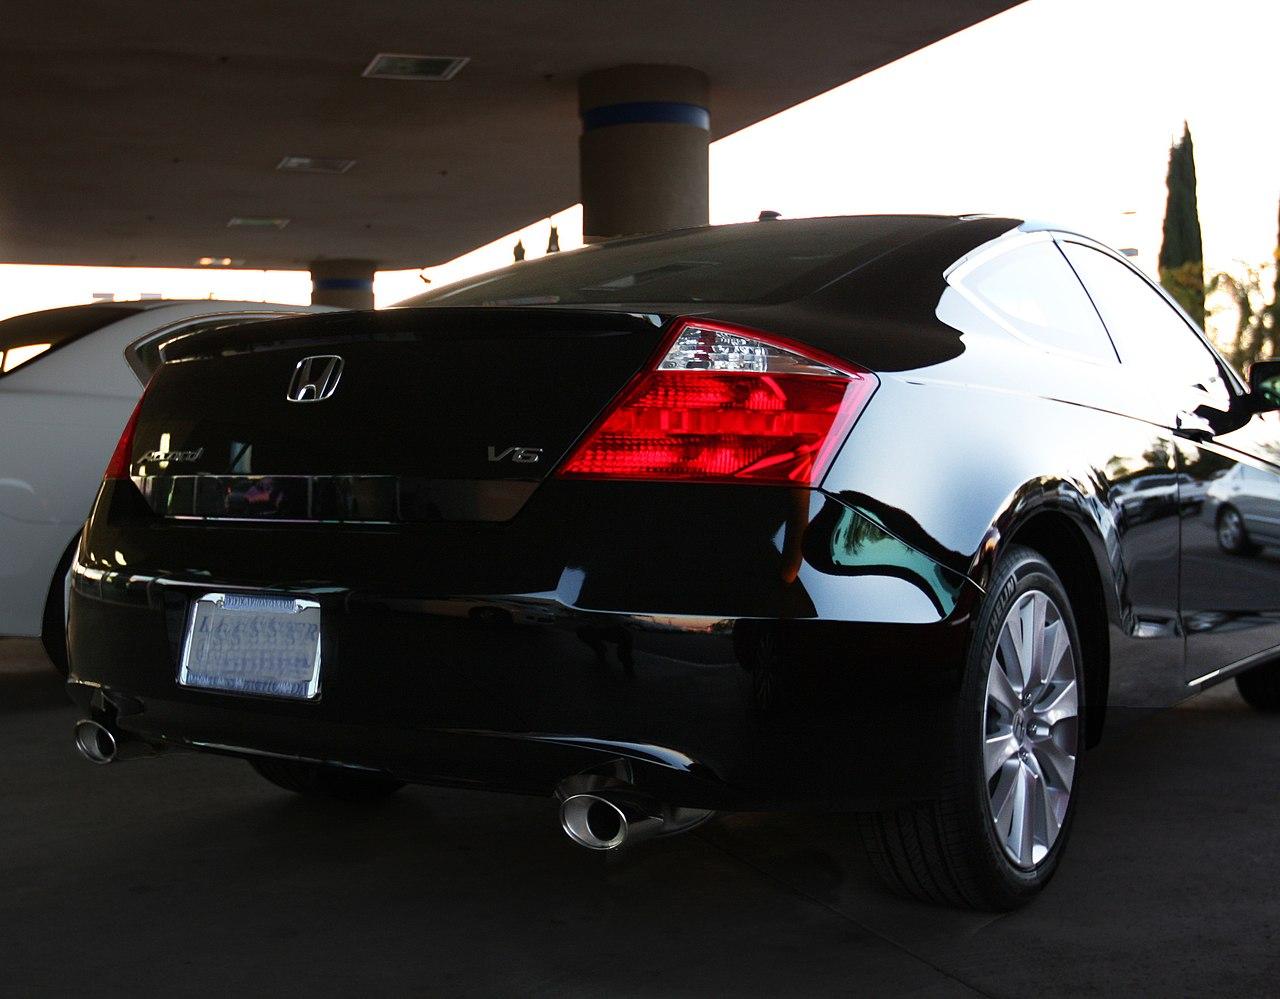 File:2010 Honda Accord Coupe (3976650487).jpg